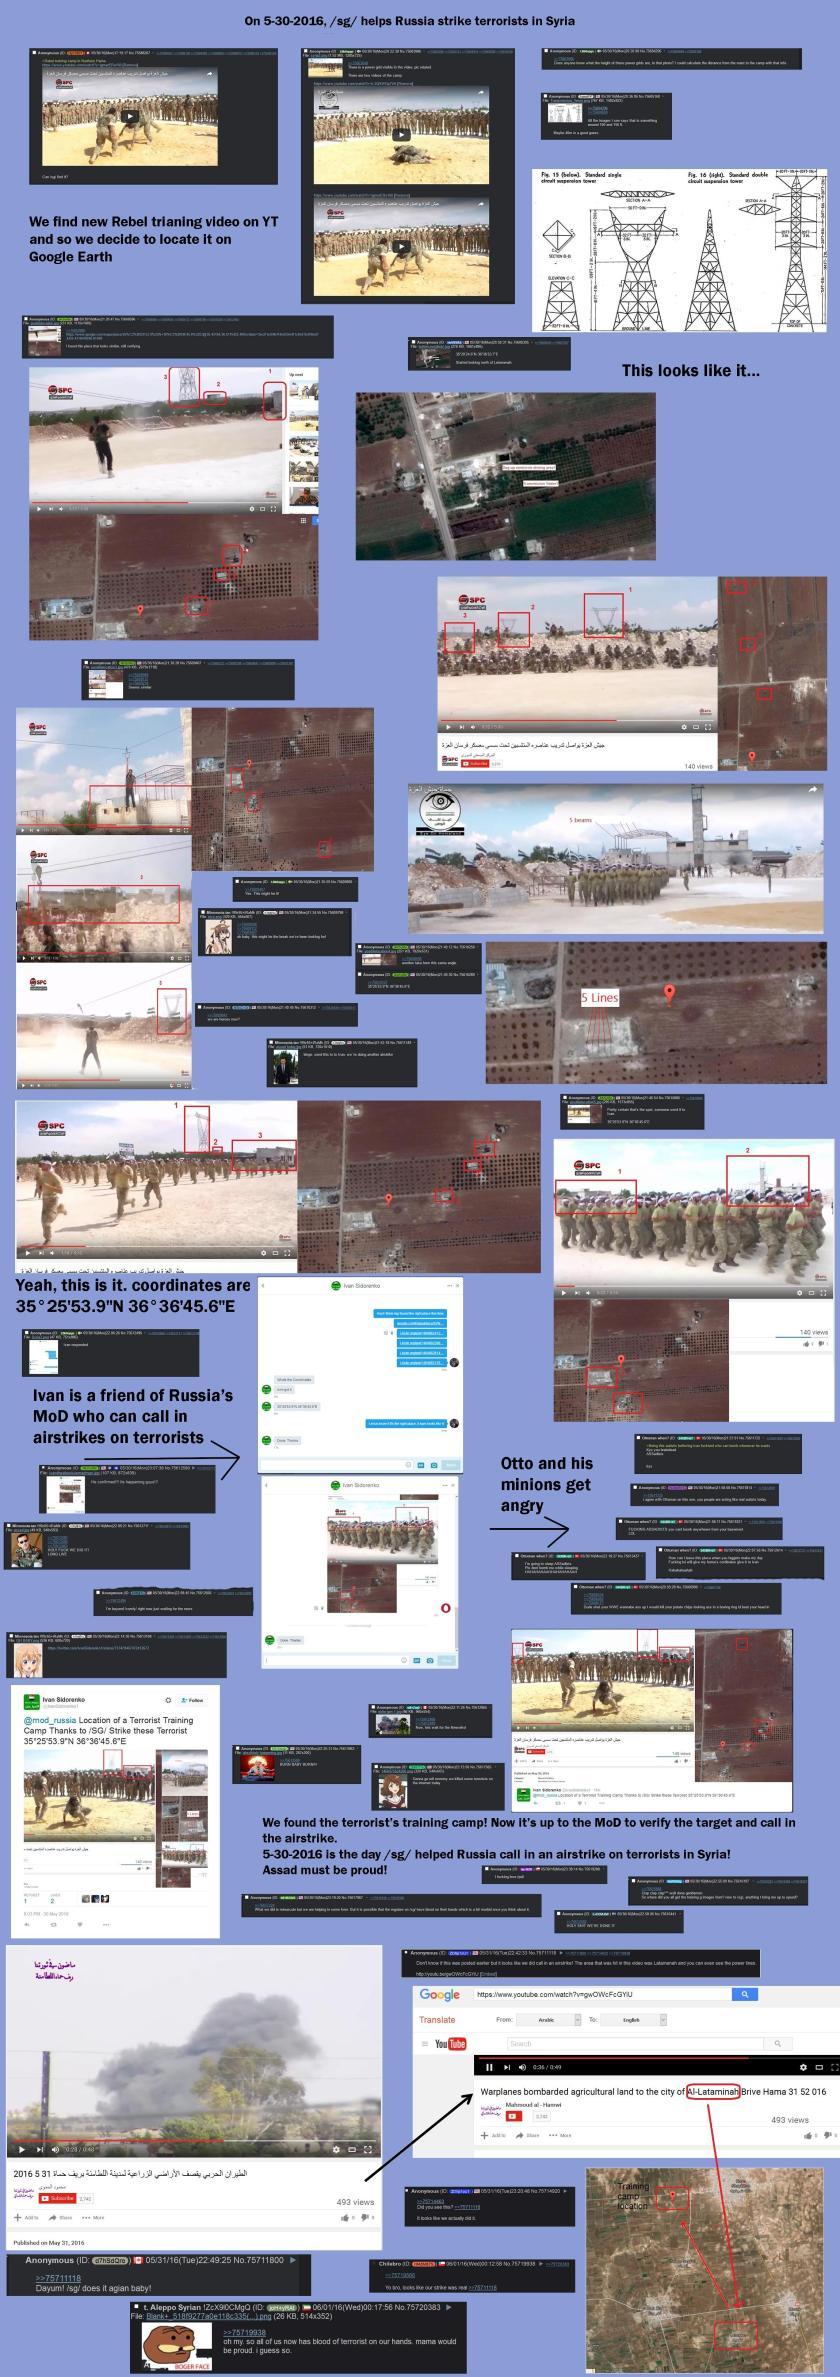 4chan airstrike.jpg